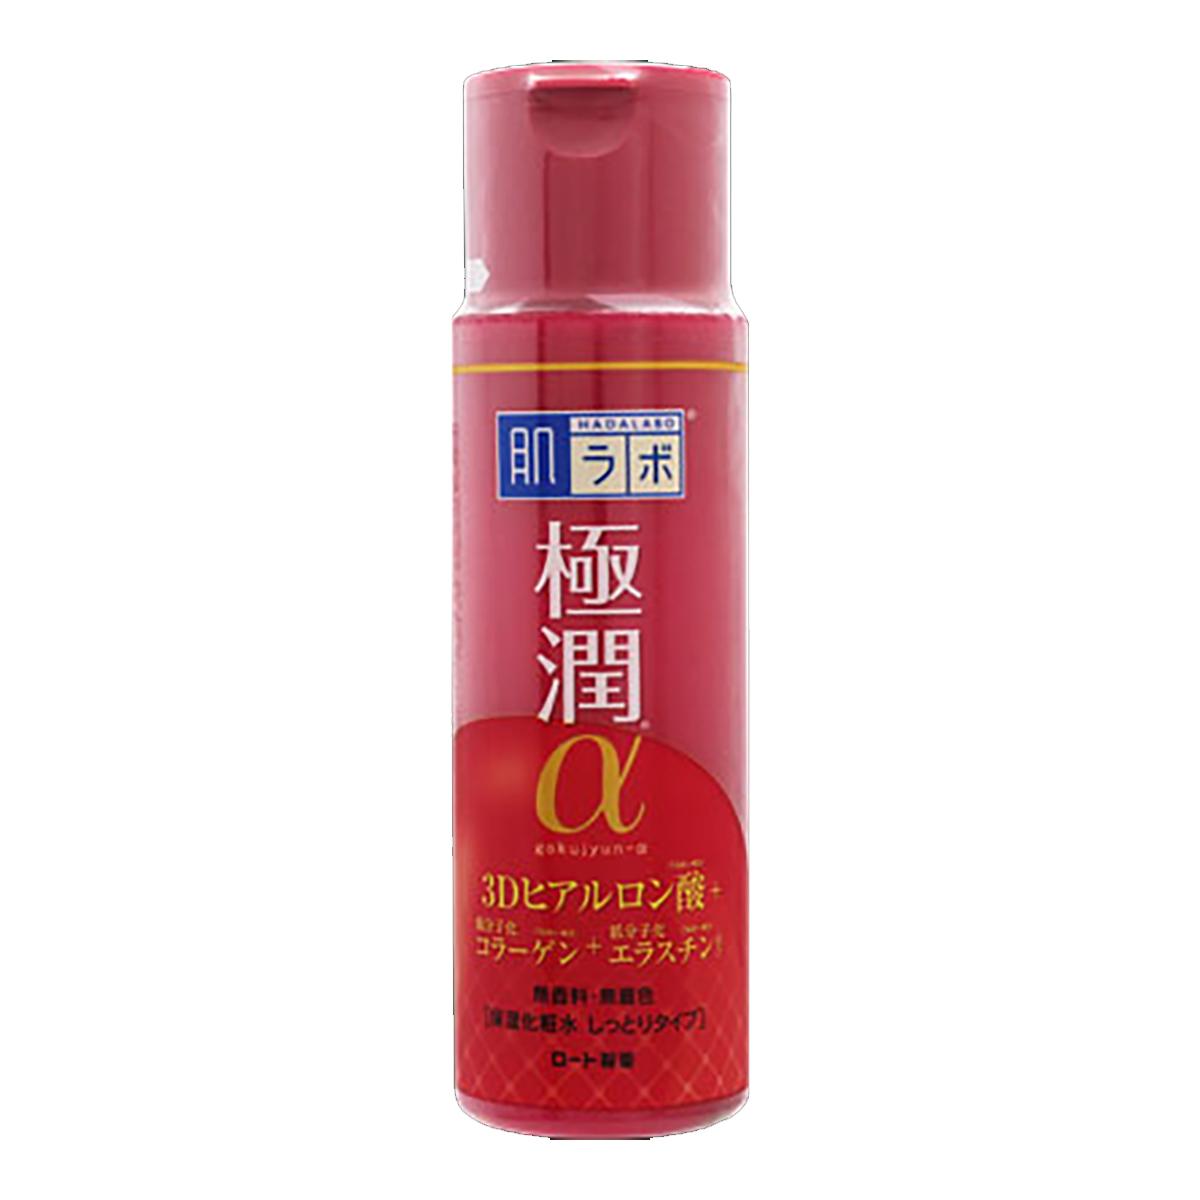 Rohto pharmaceutical skin lab ultra Jun α isoflavone lotion moist type 170 ml (4987241148493)